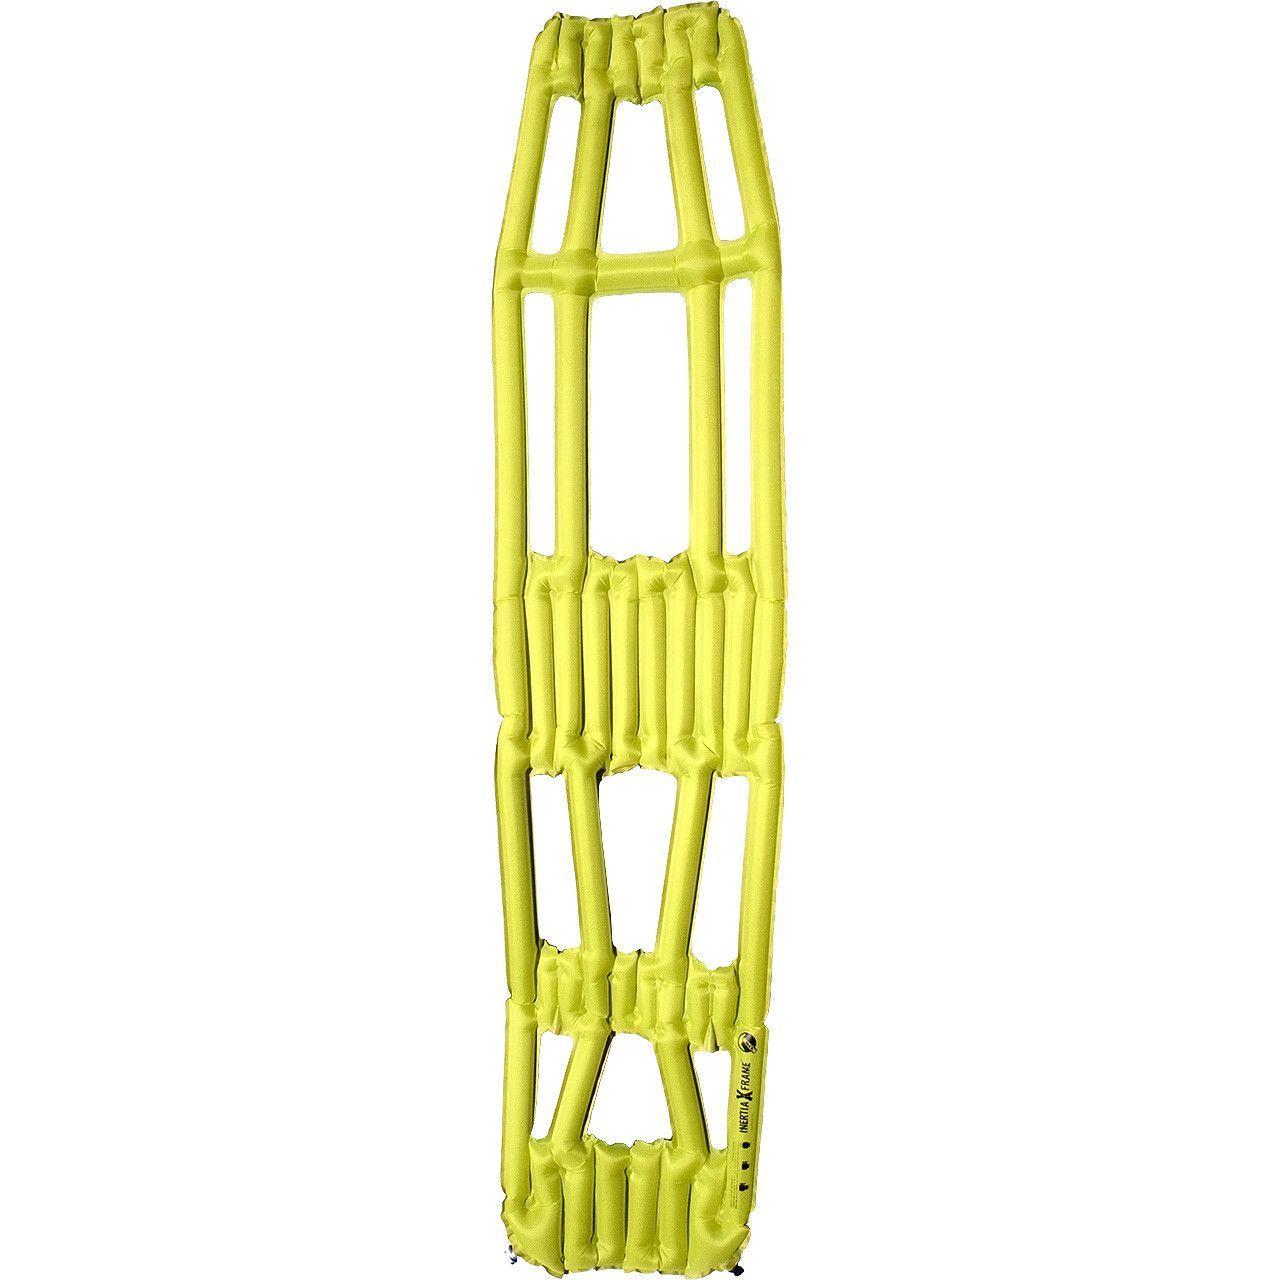 Klymit Inertia X-Frame Sleeping Pad | Products